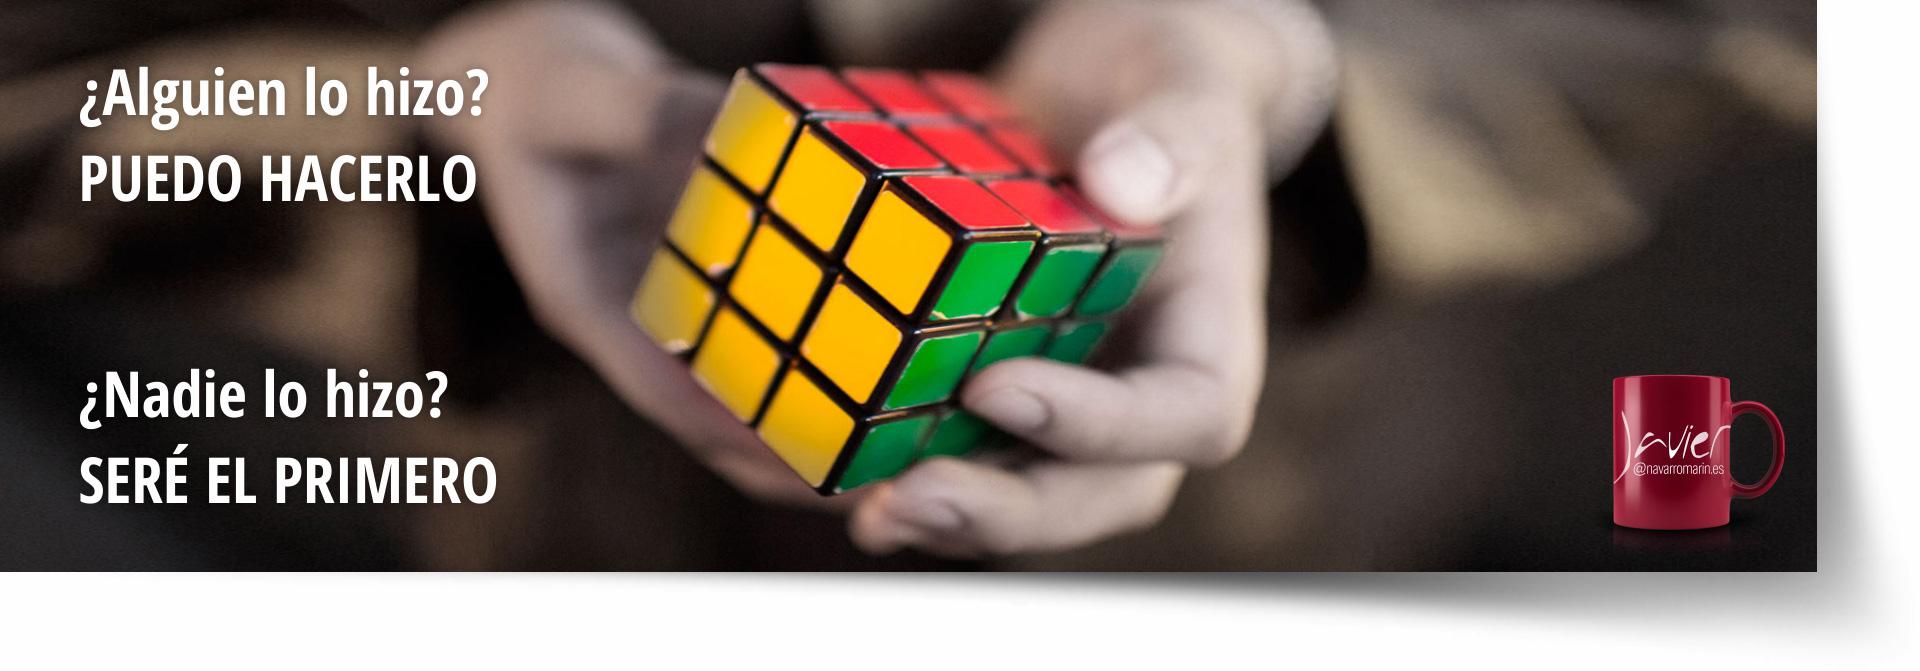 resuelve el cubo de rubick